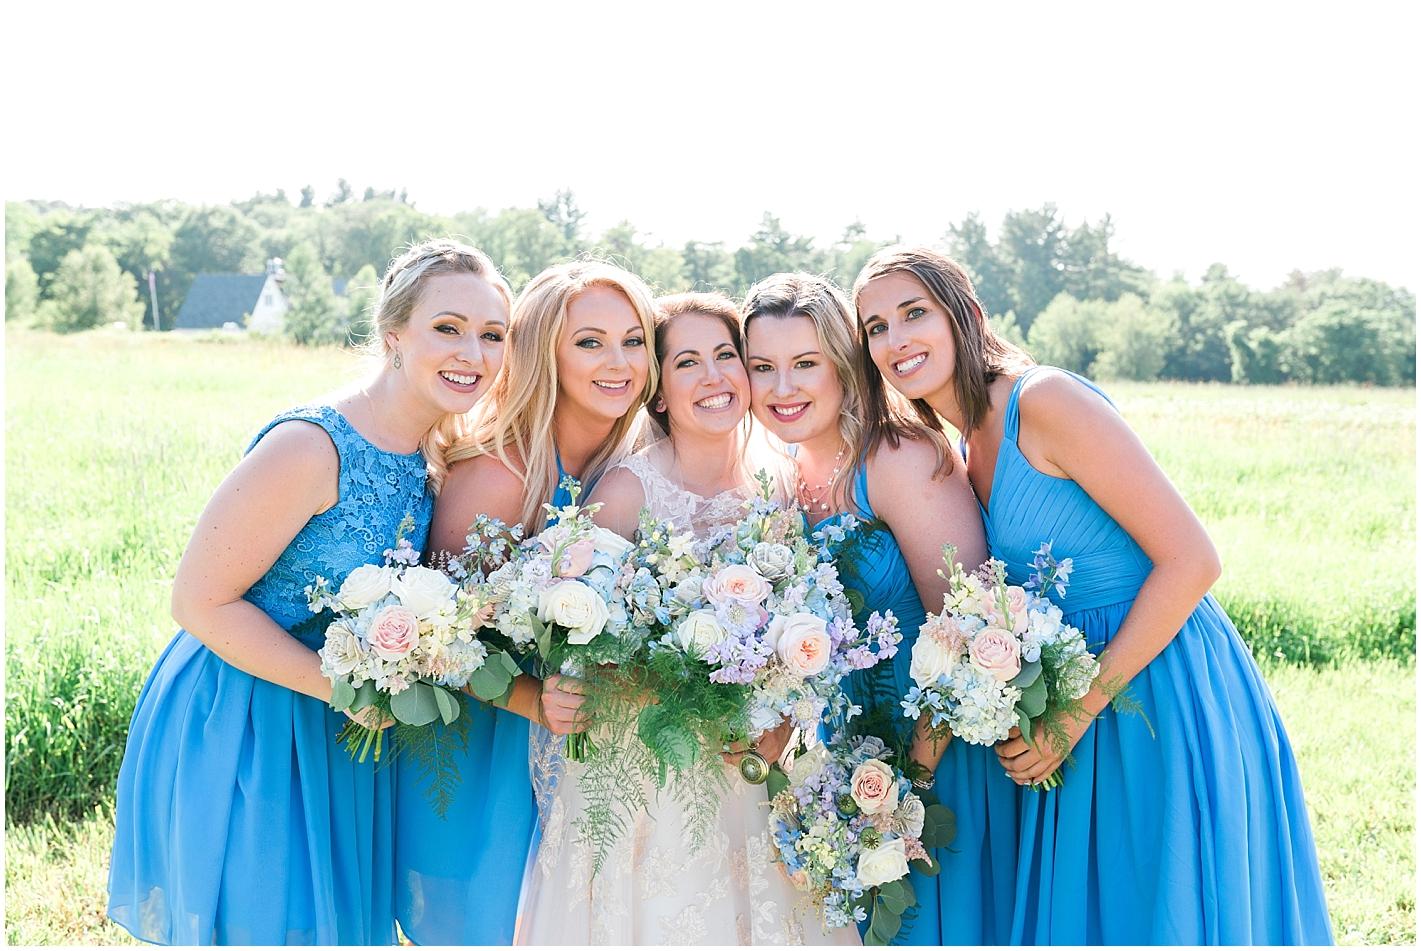 Blue short bridesmaids dresses photos by Alyssa Parker Photography